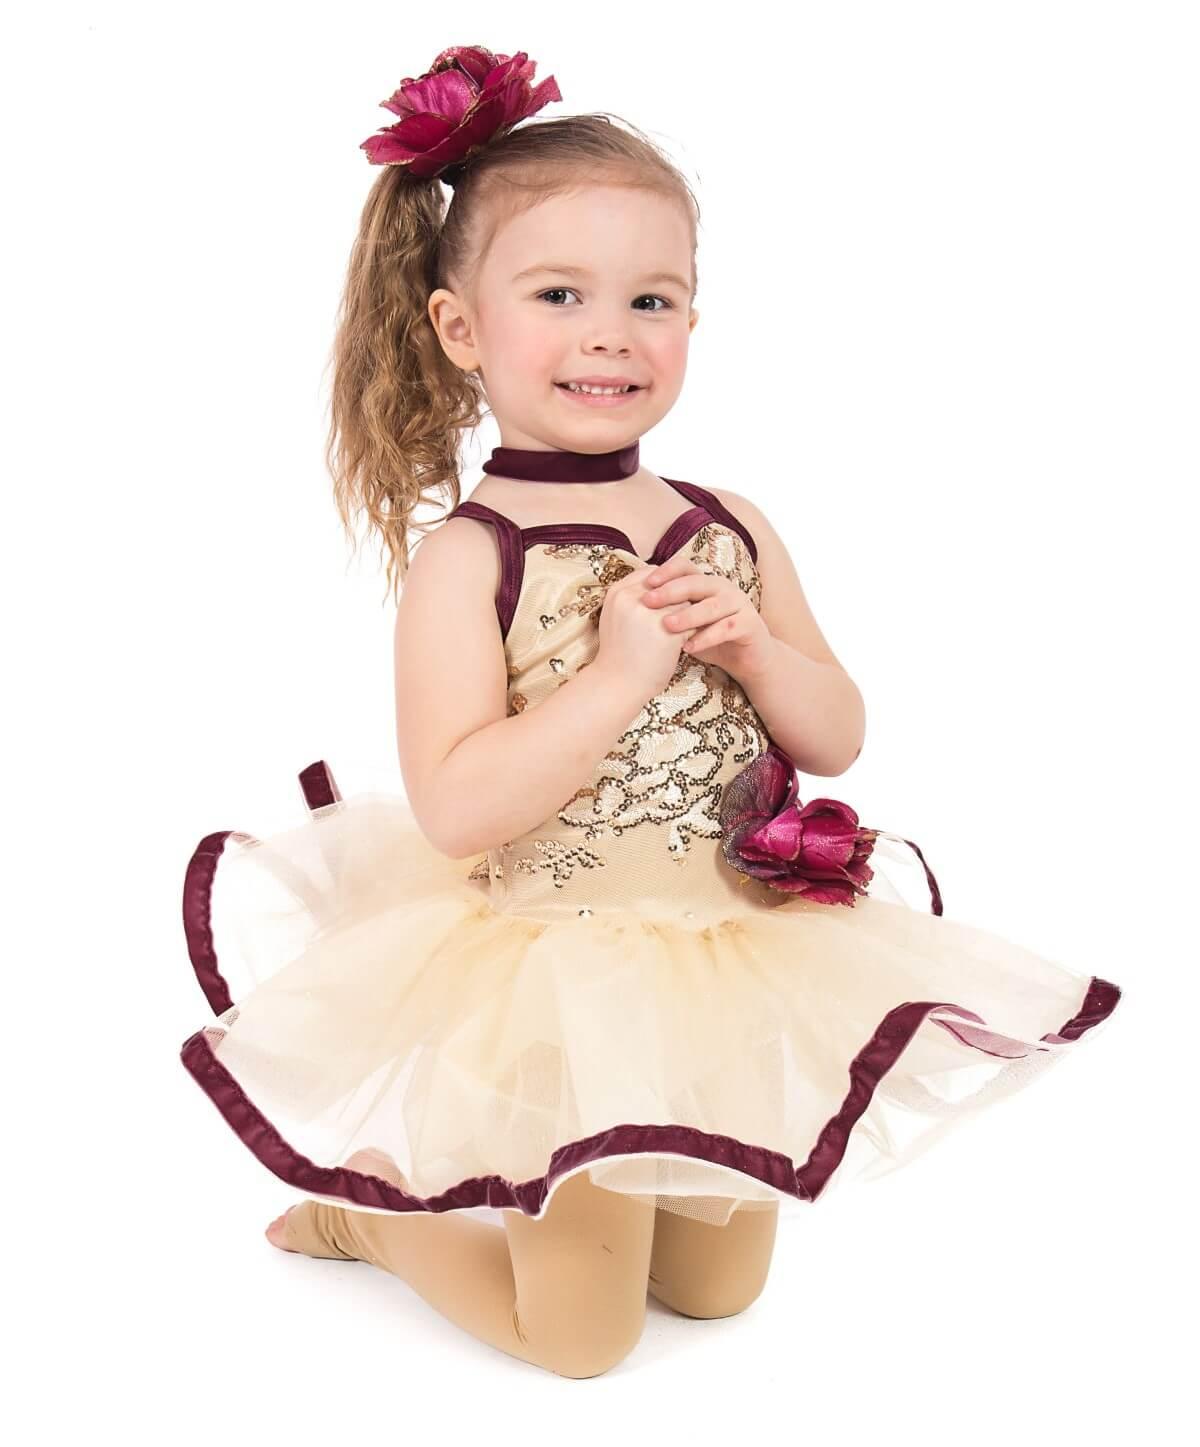 Girl in dance recital outfit